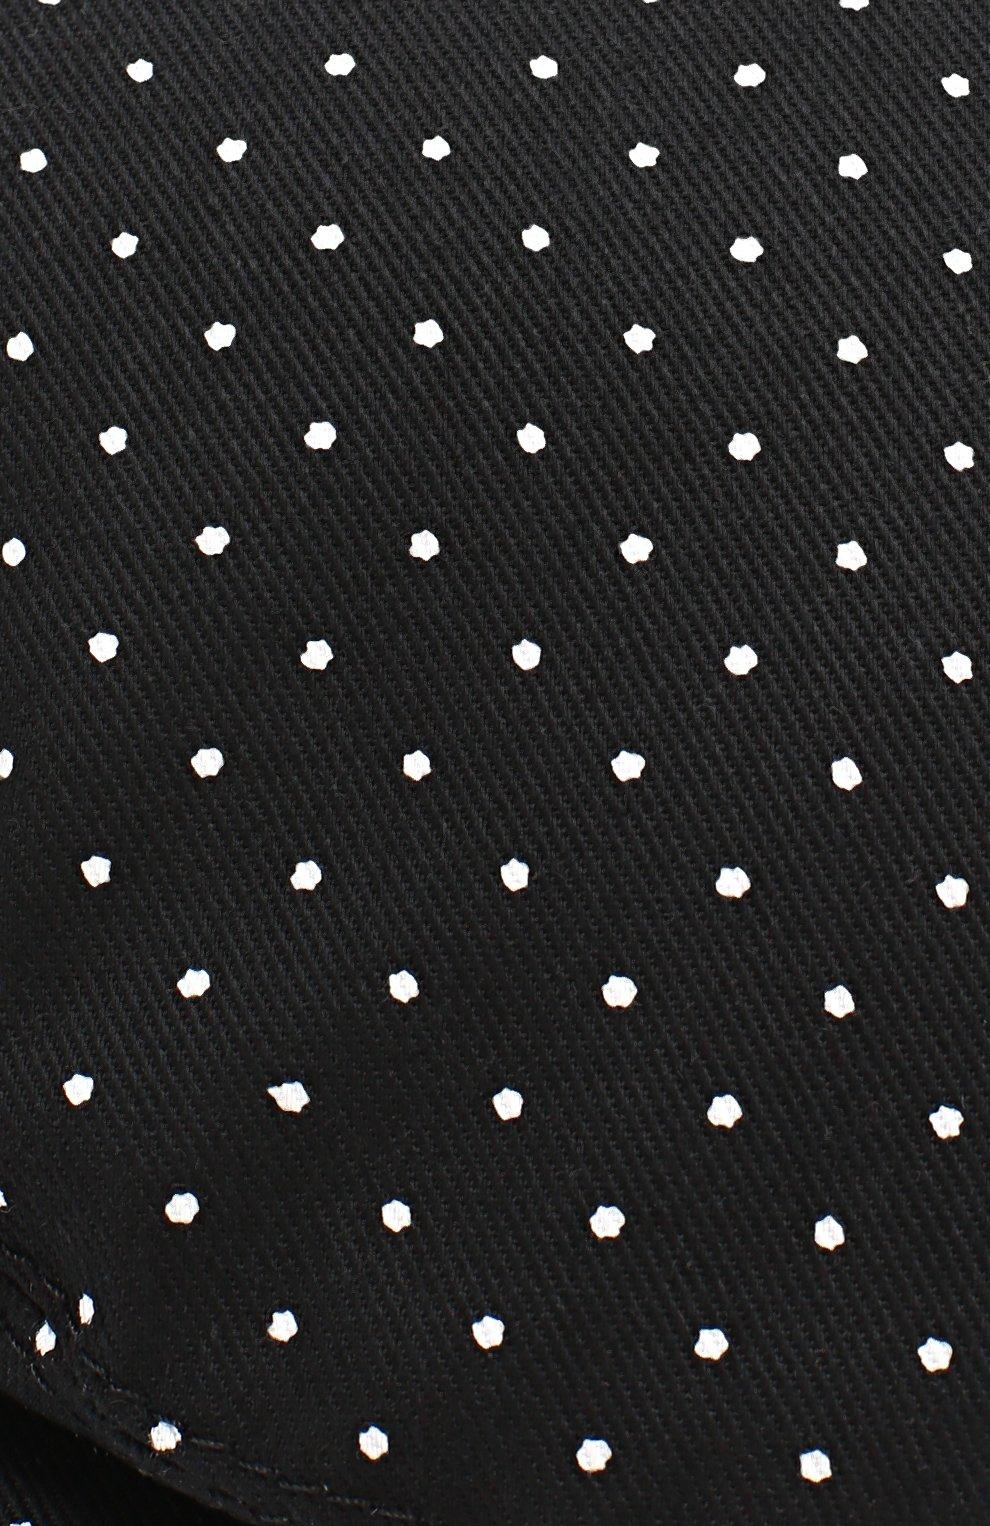 Хлопковое кепи с узором Polka Dot Dolce & Gabbana черного цвета | Фото №4